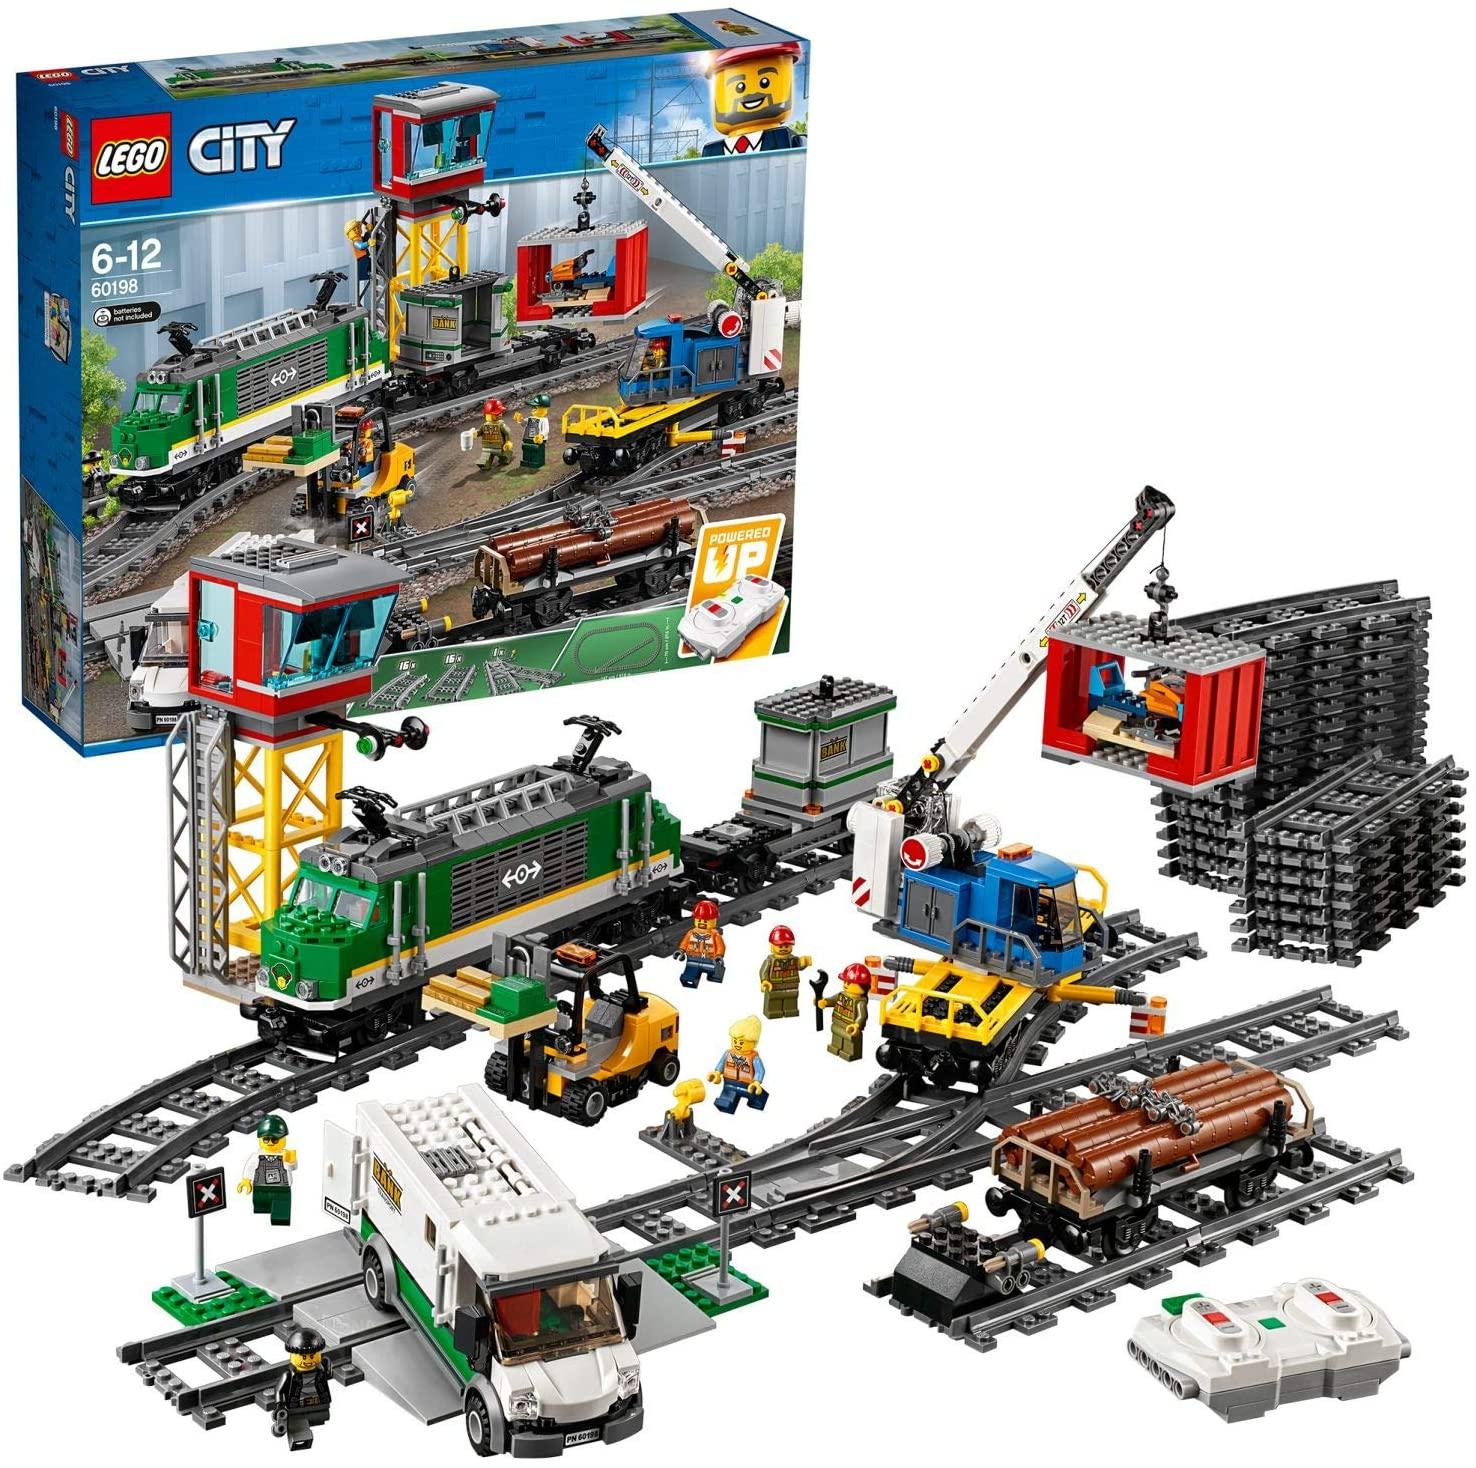 [Amazon Prime] LEGO SAMMELDEAL - GUTSCHEINAKTION bei Amazon - Star Wars - Harry Potter - Lego Technik - Ninjago